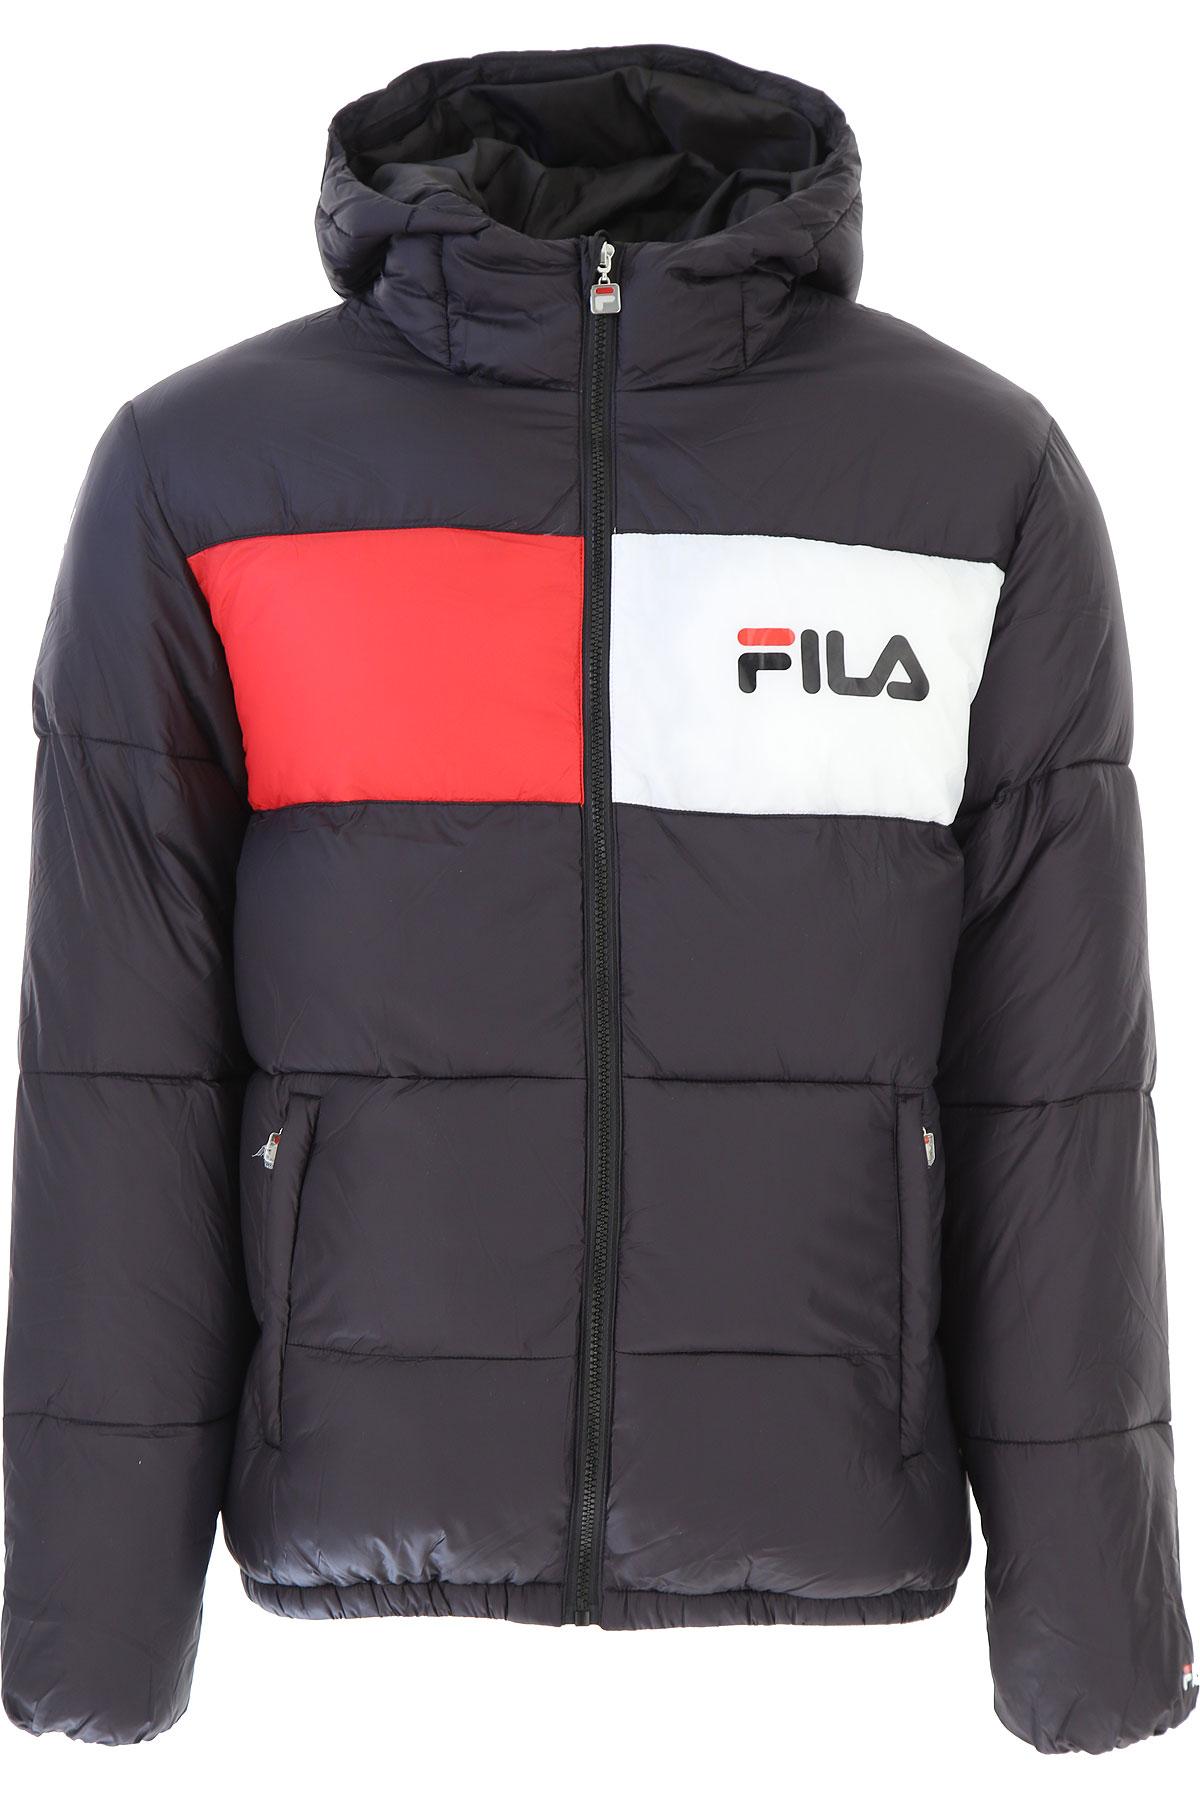 Image of Fila Down Jacket for Men, Puffer Ski Jacket, Black, polyamide, 2017, L M S XL